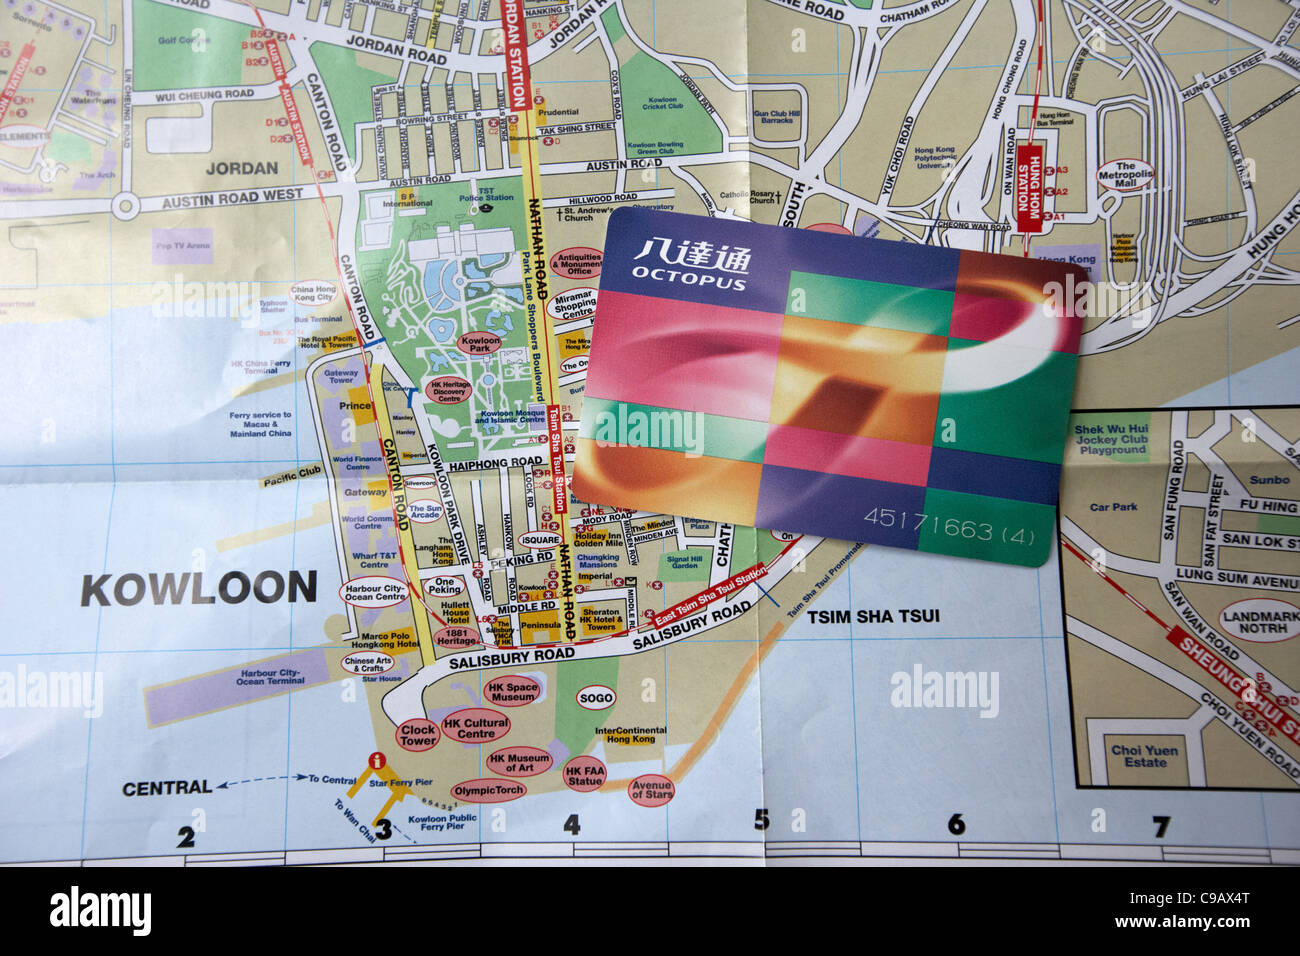 Touristenkarte von Kowloon Hong Kong mit Octopus Reisen Karte Stockbild